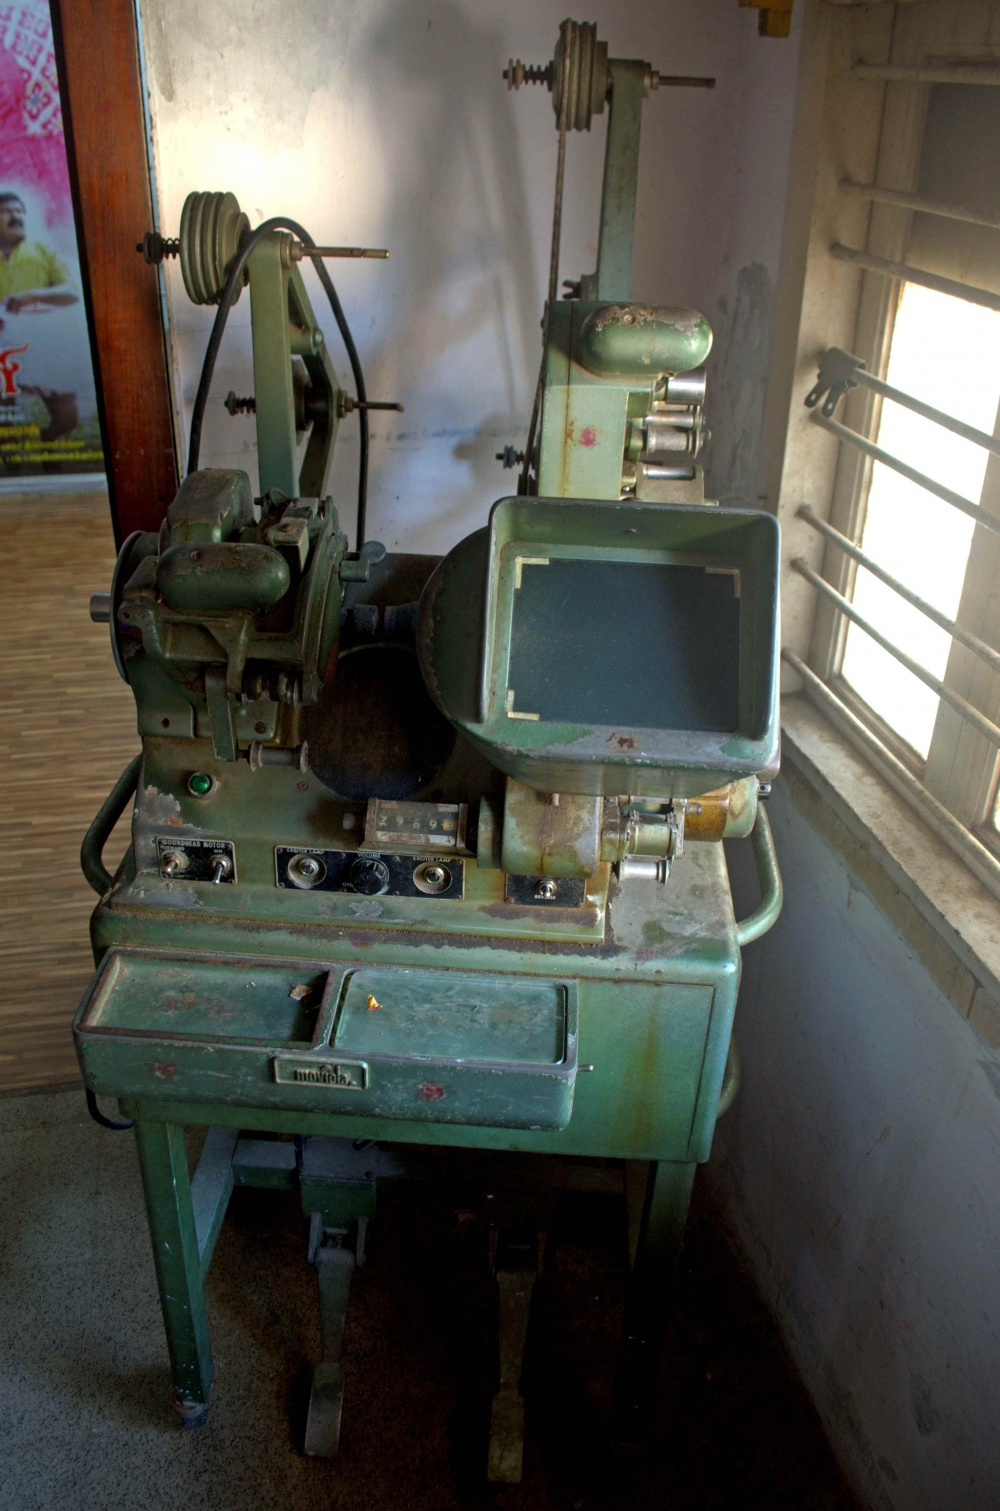 Fig. 6. A Moviola linear editing machine at the AVM Complex (Courtesy: Senjuti Mukherjee)